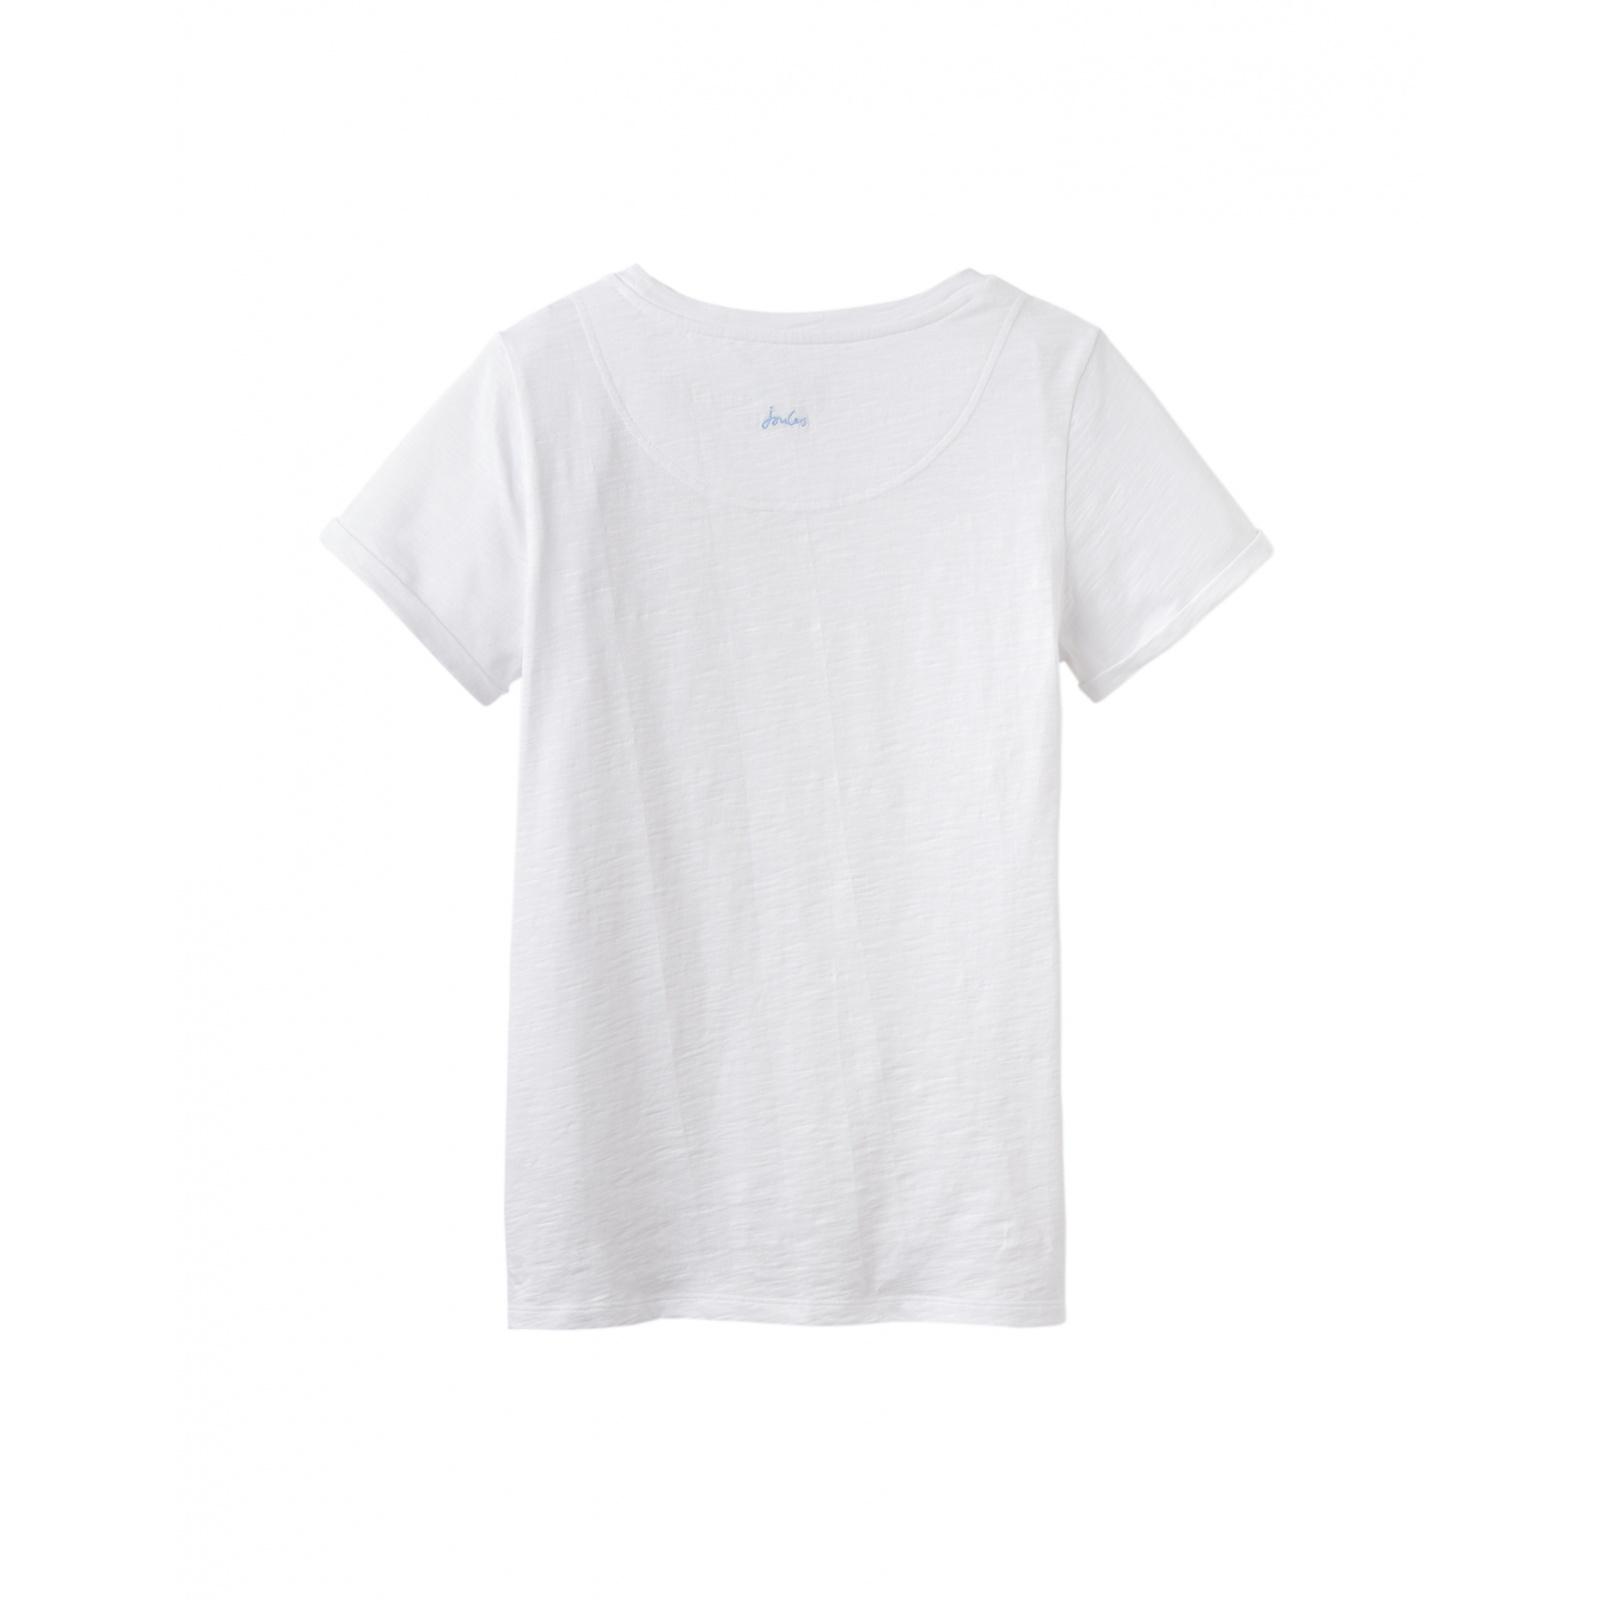 Joules-Nessa-ligero-Jersey-Camiseta-SS19 miniatura 11